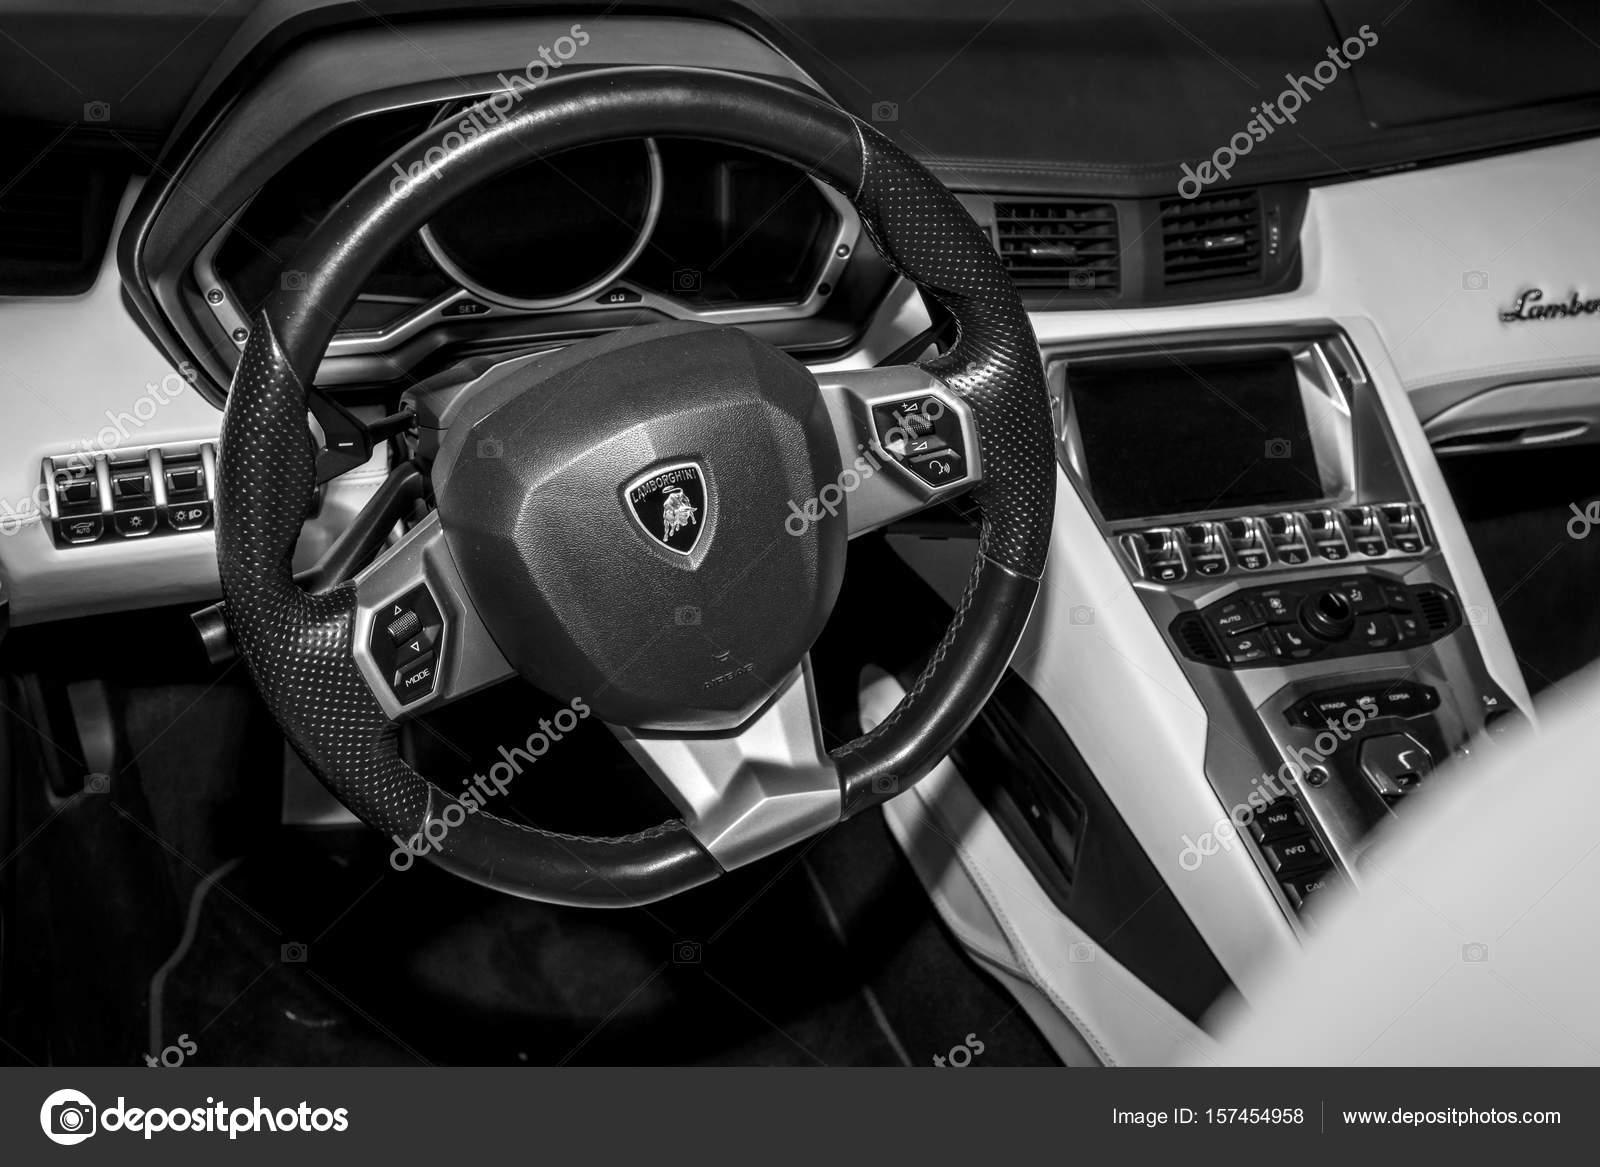 Innenraum des Lamborghini Aventador — Redaktionelles Stockfoto ...